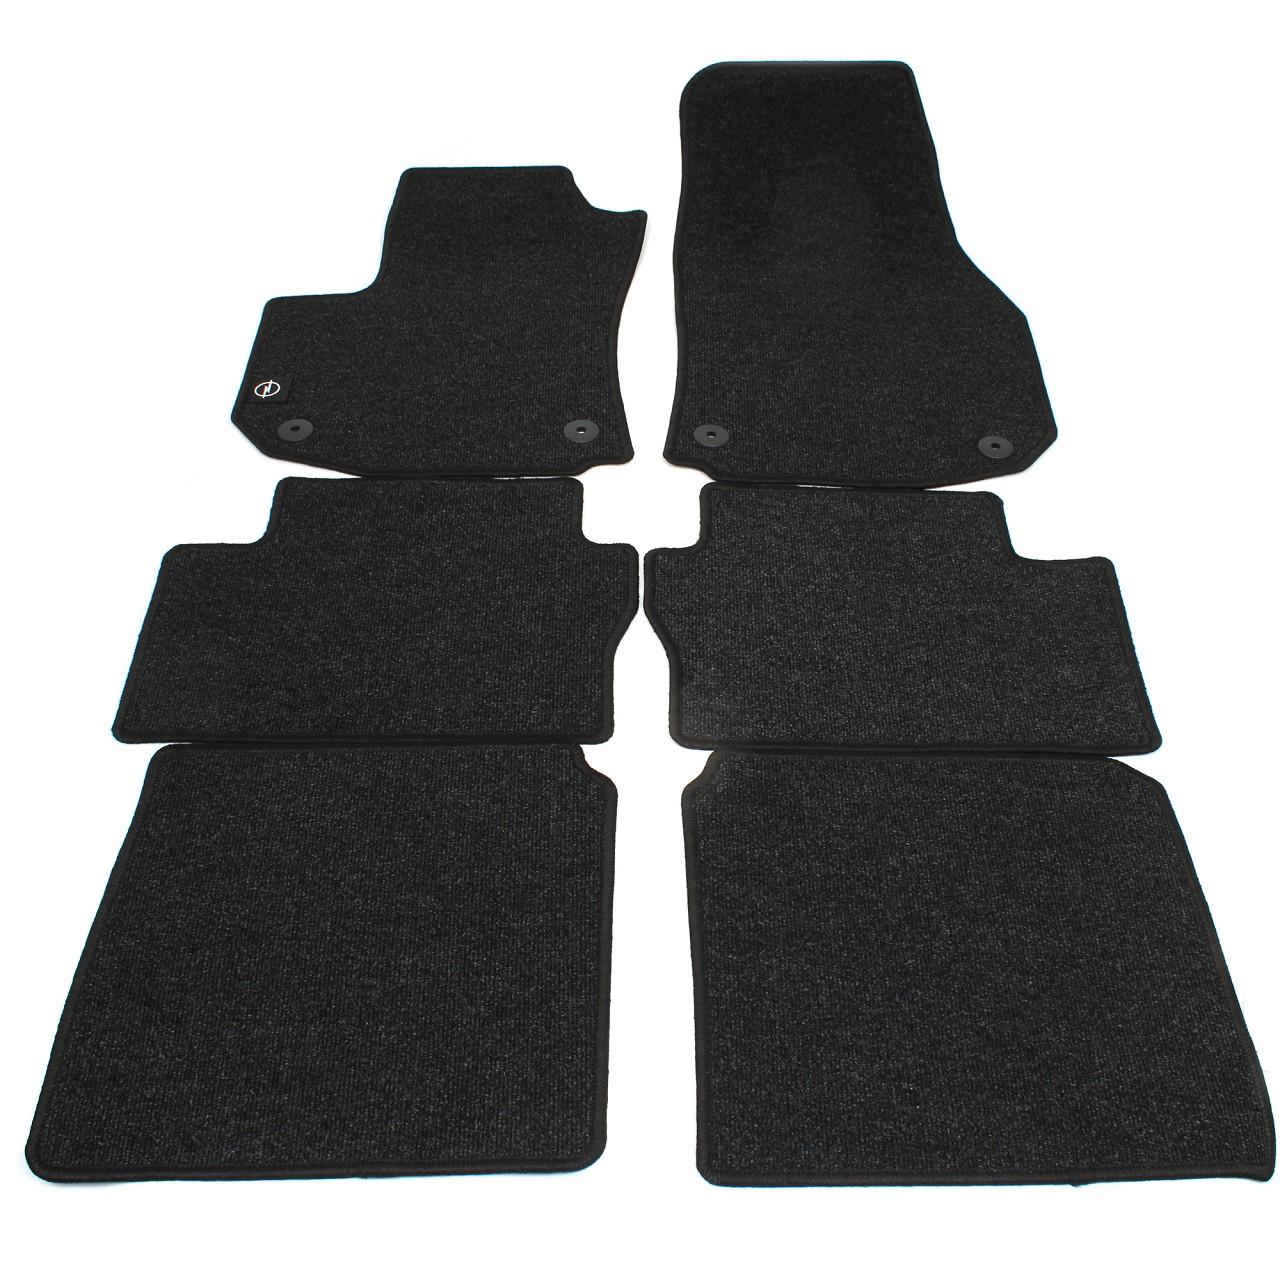 ORIGINAL Opel Textilmatten Fußmatten Automatten Satz Zafira B 6-tlg 1724056